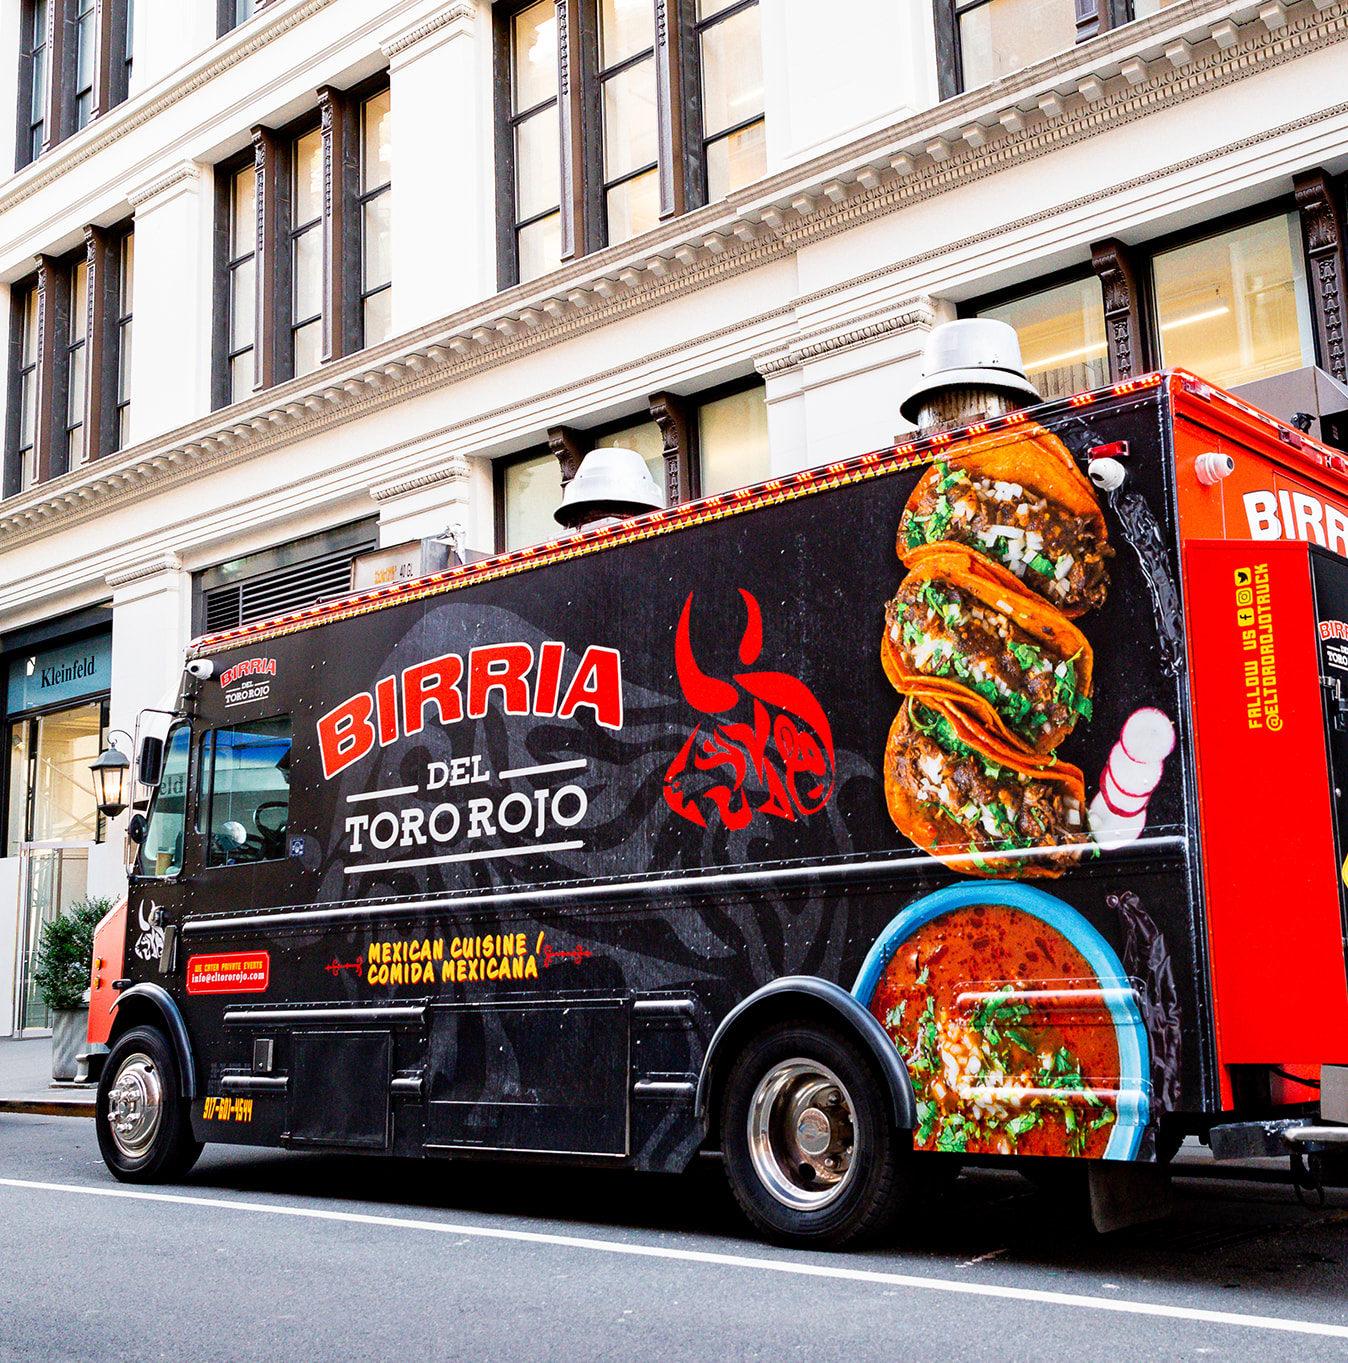 El Toro Rojo Taco Food Truck NYC